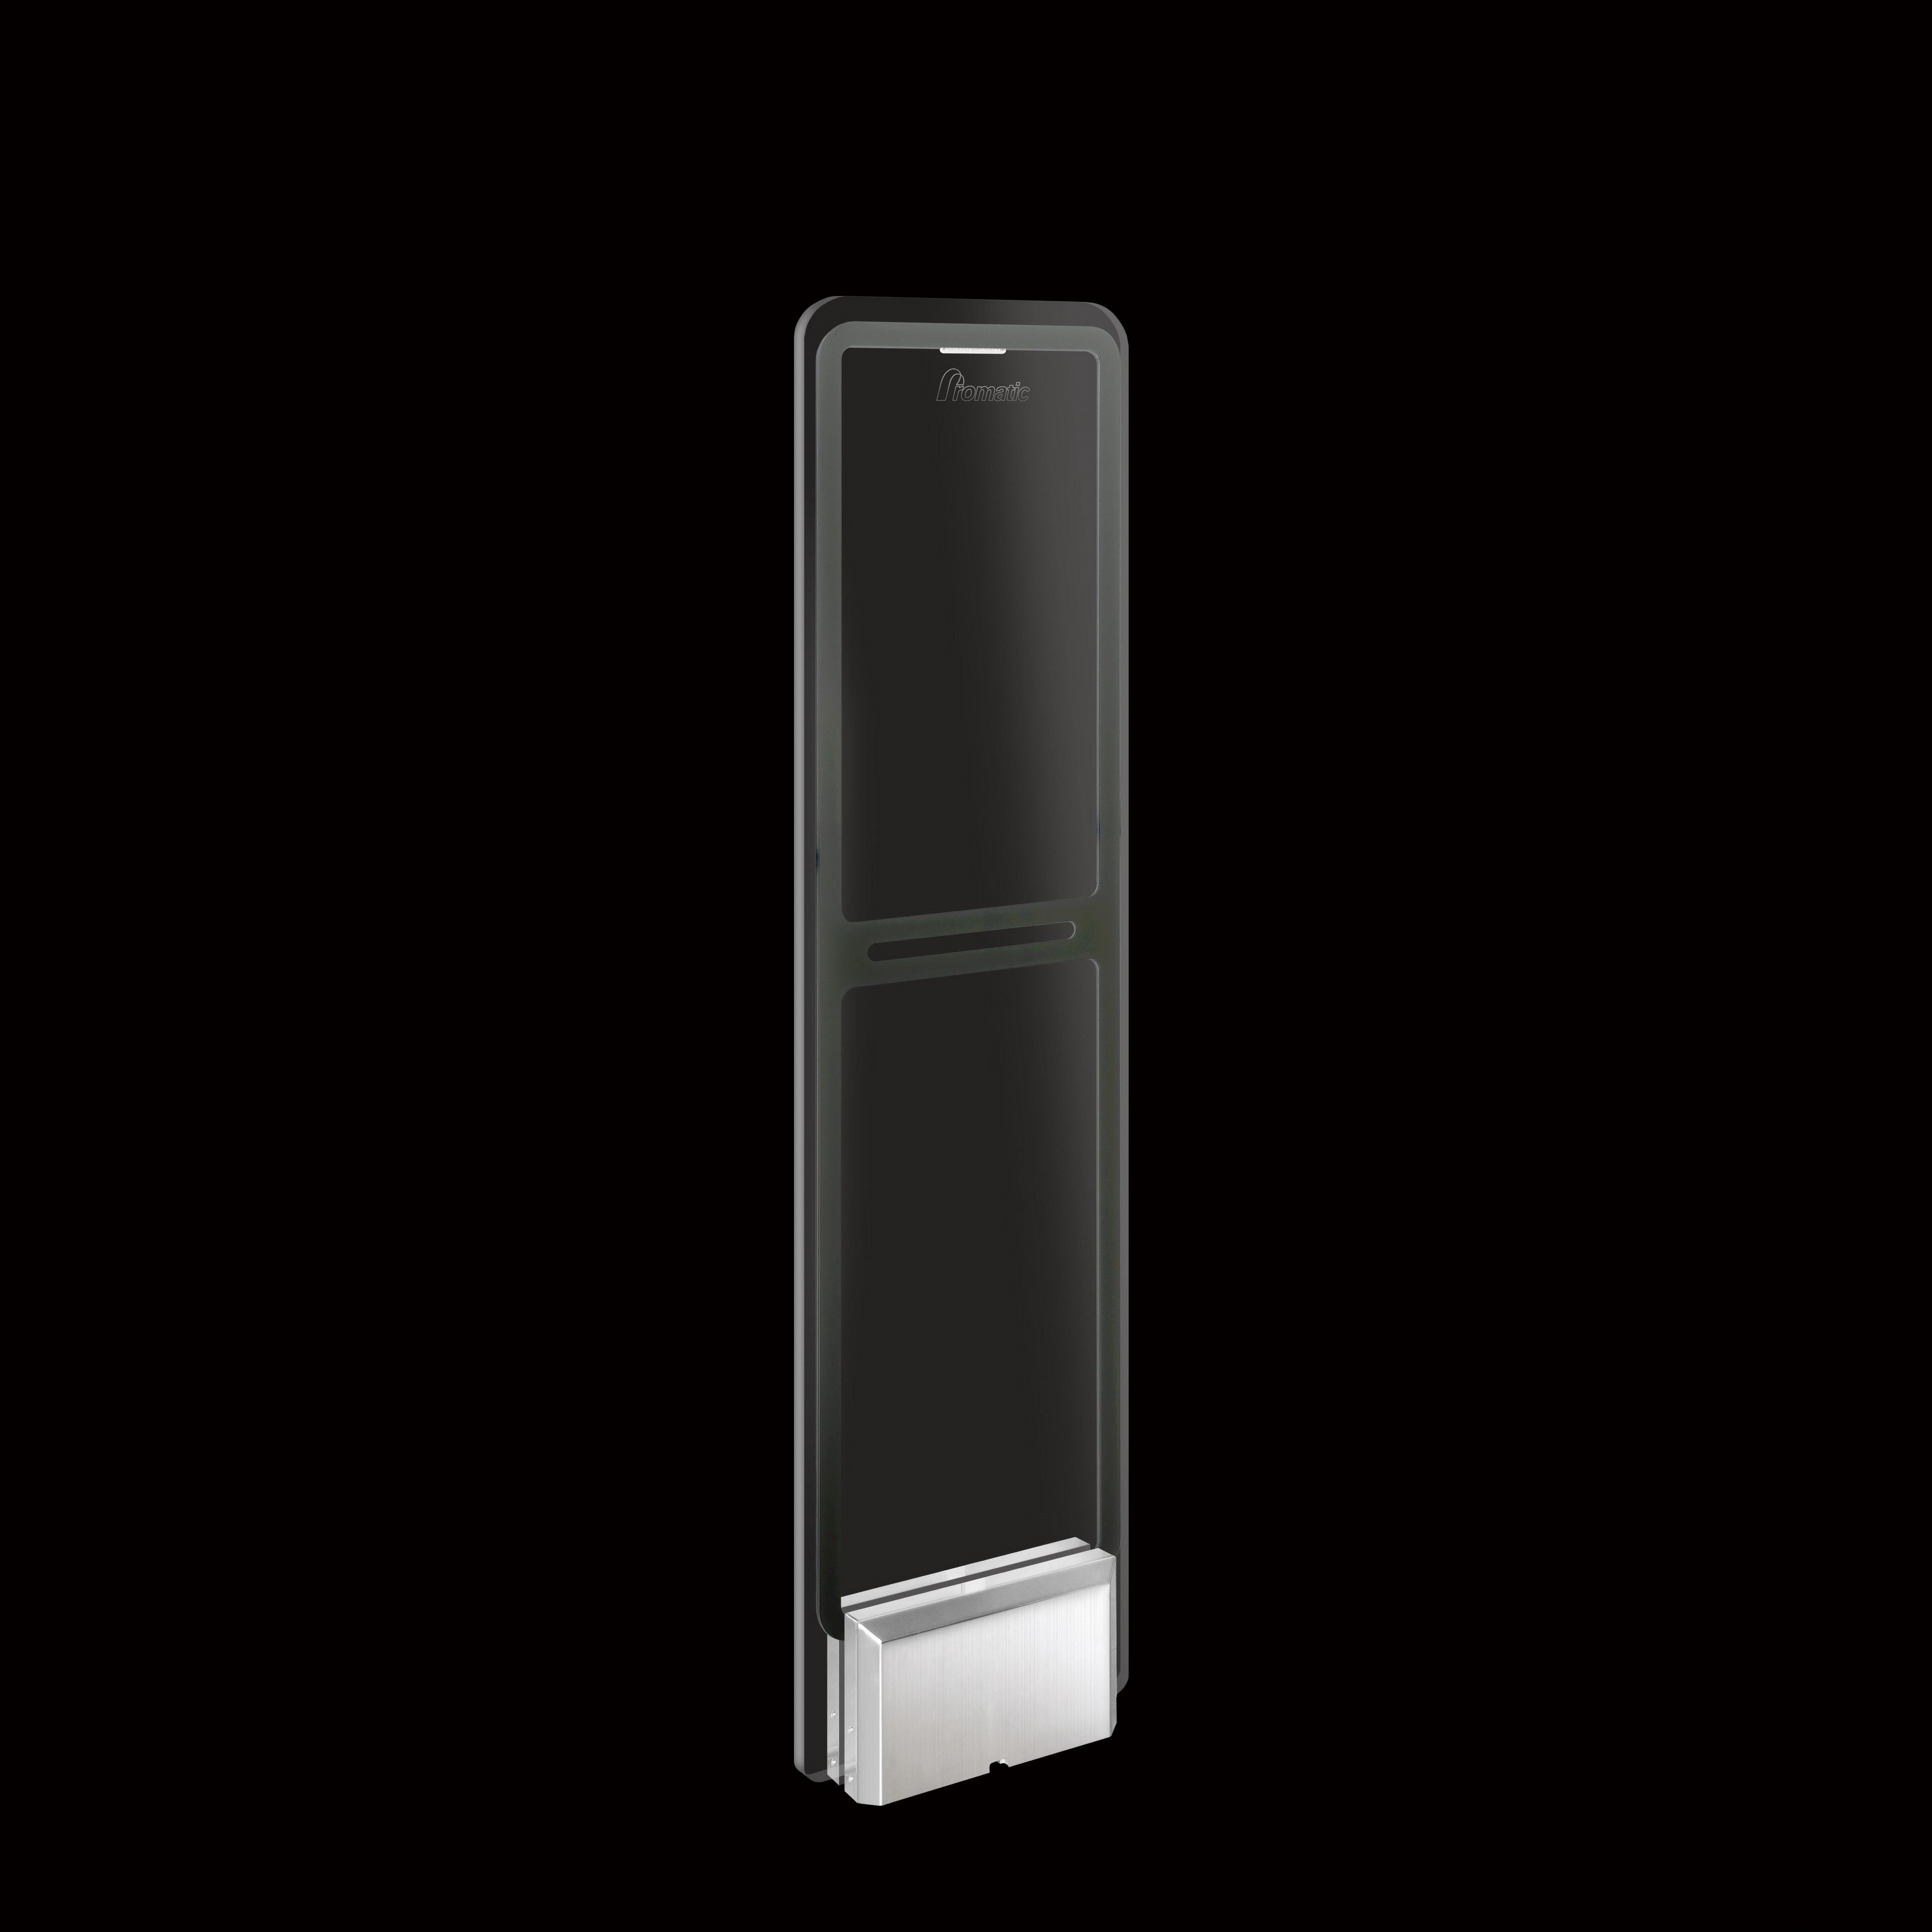 PAS9020P 声磁商品电子防盗系统(AM EAS)智能检测器主机